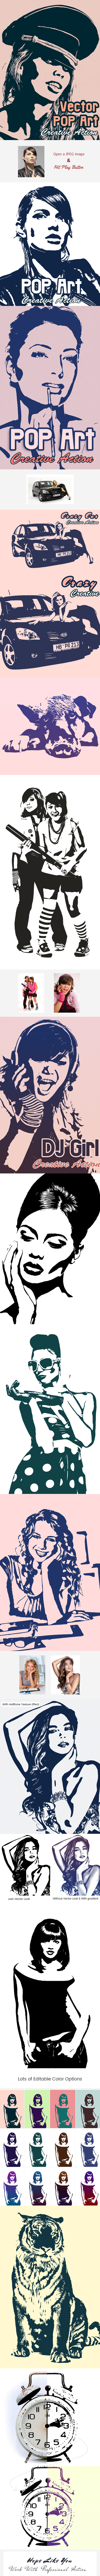 Vector Pop Art Photoshop Action Free Download on Behance